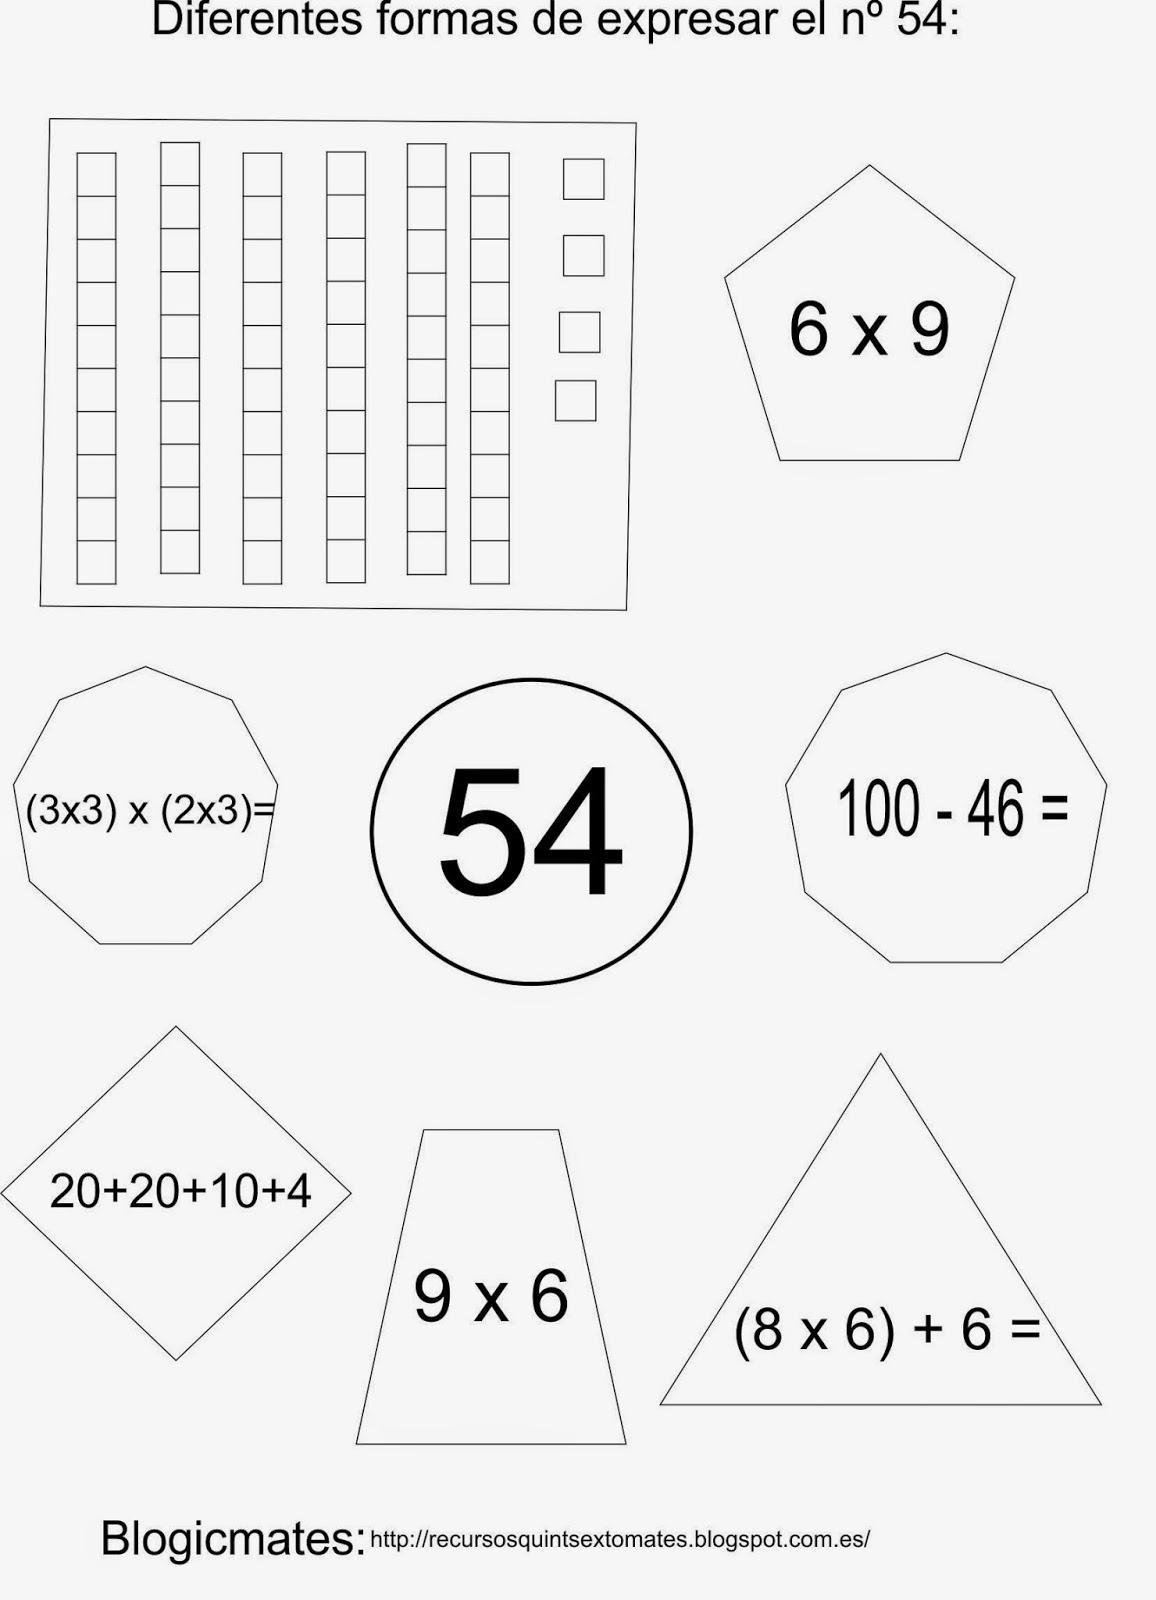 https://dl.dropboxusercontent.com/u/5730612/MATEM%C3%81TICAS/EXPRESAR%20NUMEROS.pdf